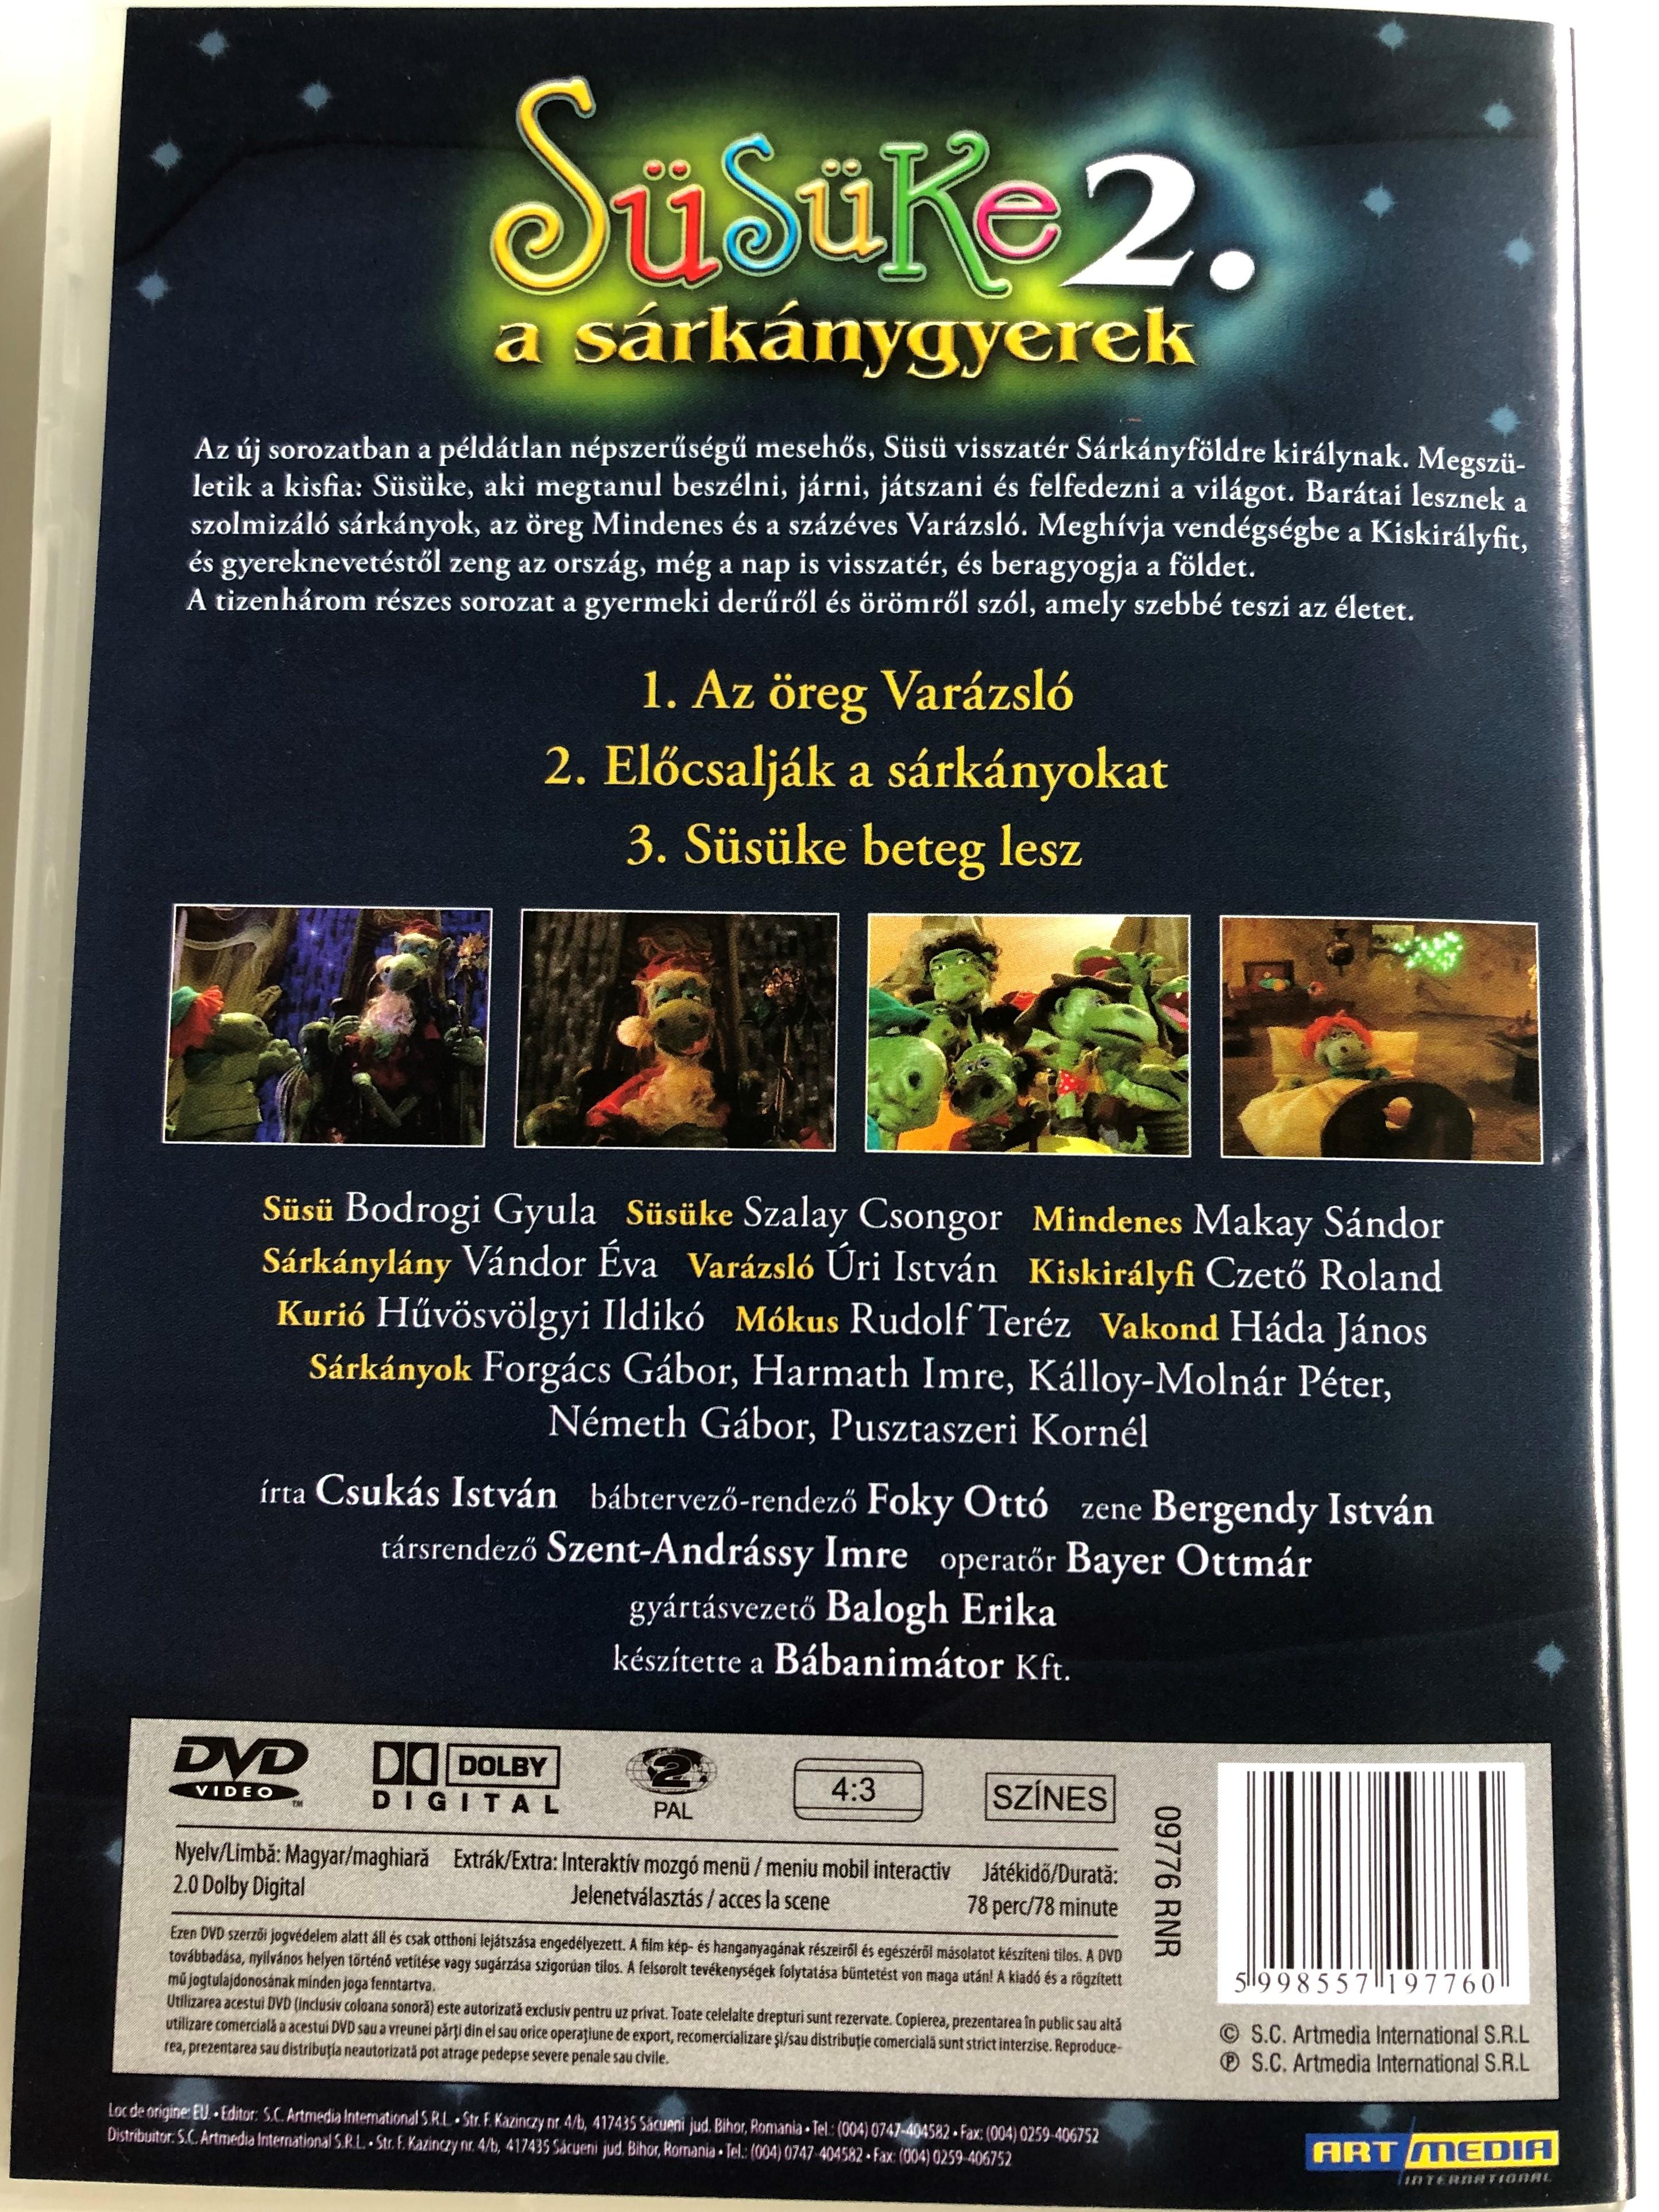 s-s-ke-a-s-rk-nygyerek-2.-dvd-2001-s-s-ke-beteg-lesz-2.jpg